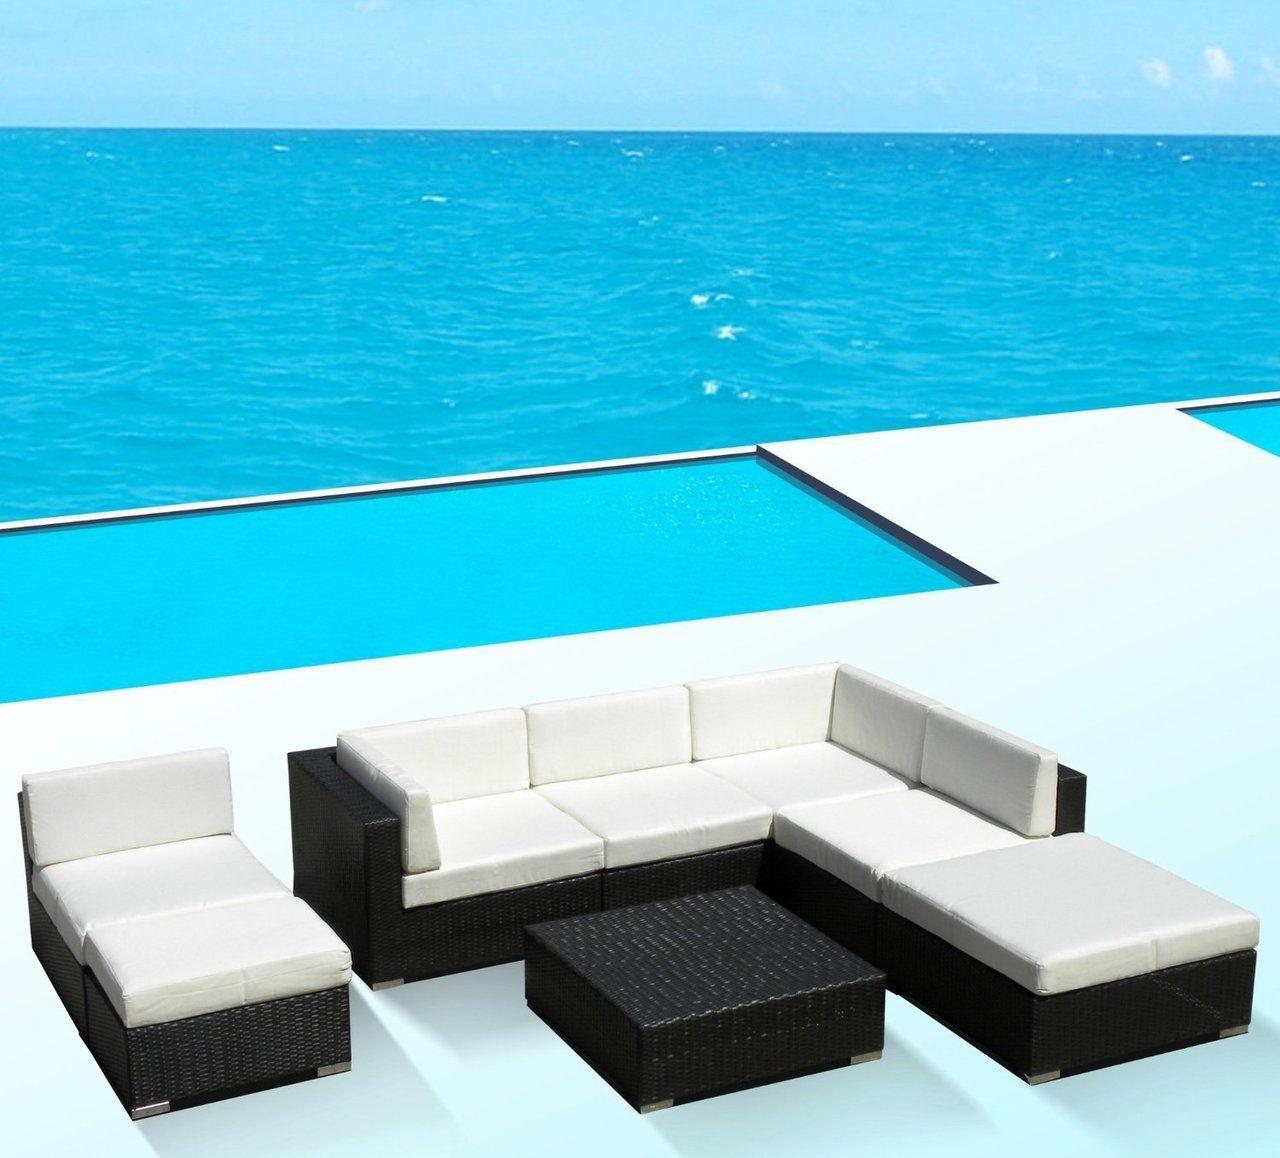 Vilano 8 Piece Sectional Modern Outdoor Patio Patio Sofa Patio Furniture For Sale